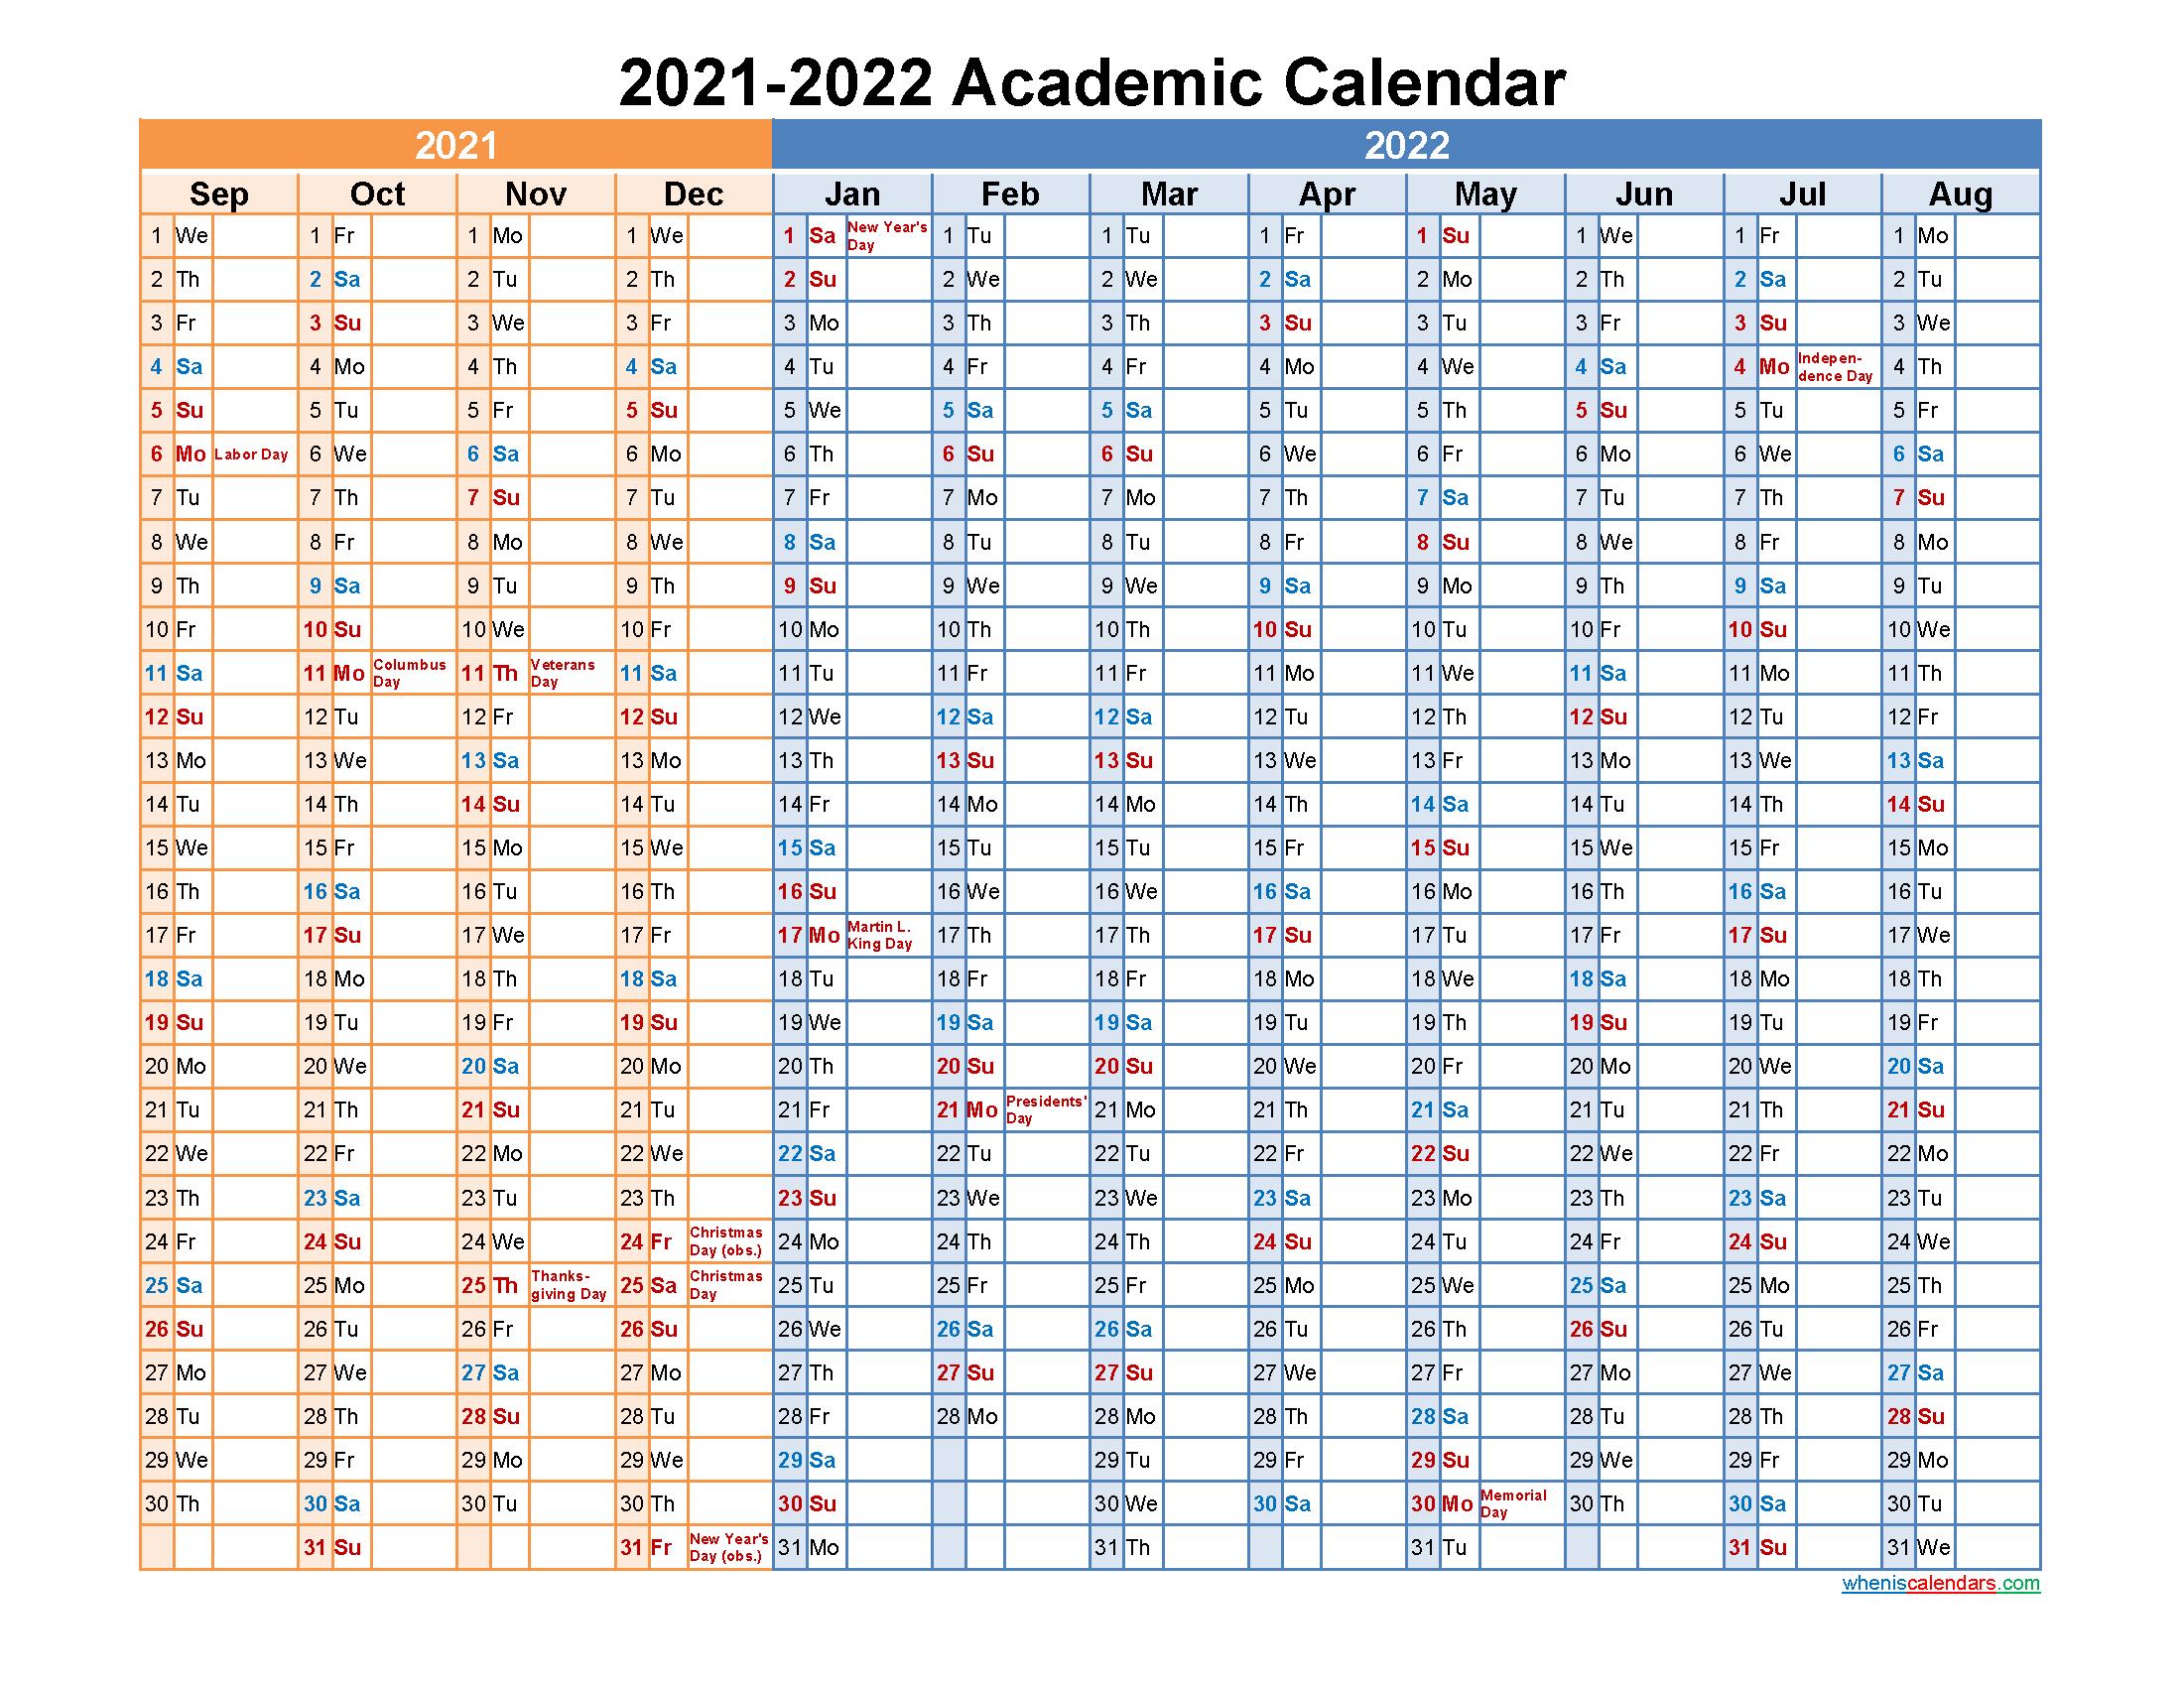 Academic Calendar 2021 and 2022 Printable (Landscape ...